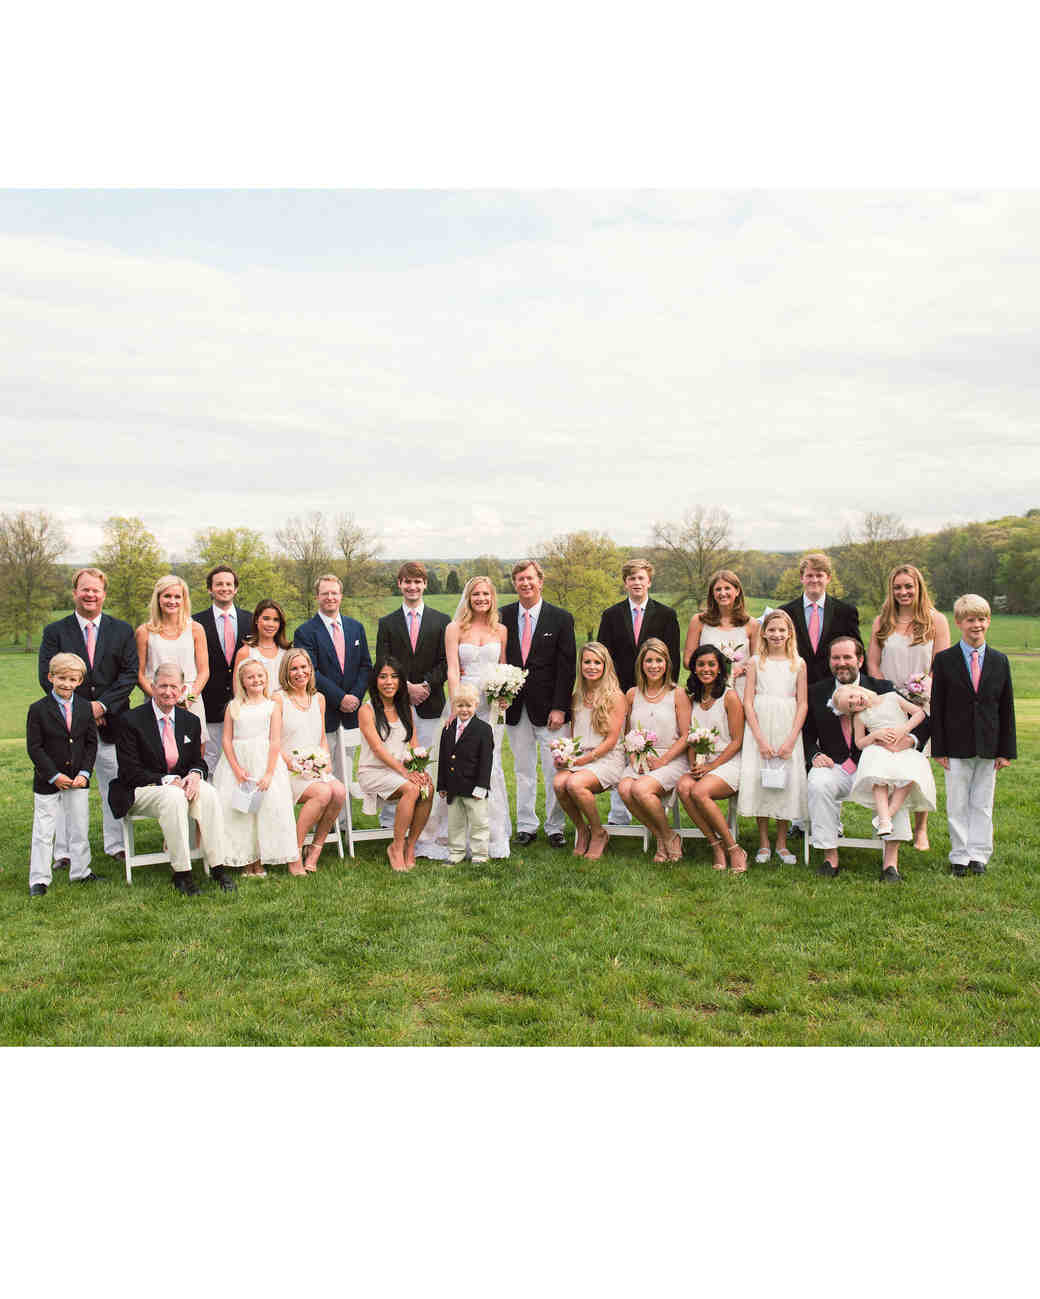 katy andrew wedding bridal party